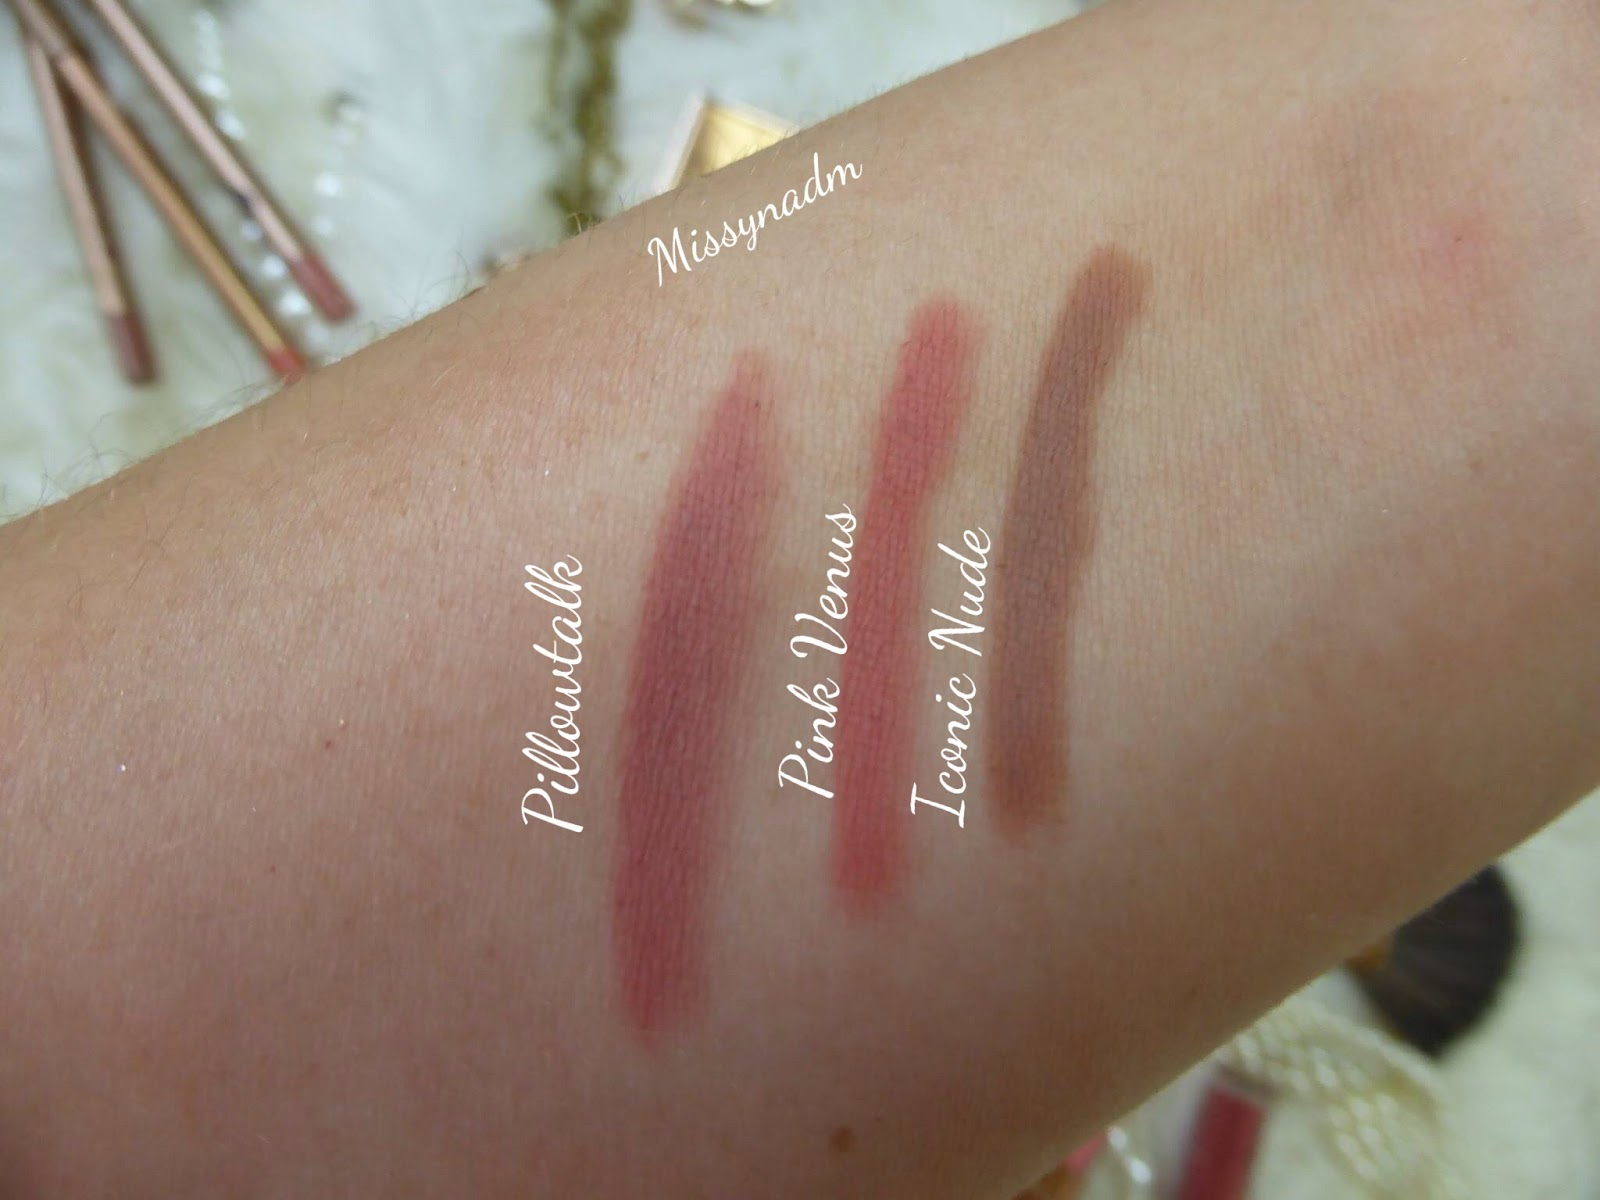 Lip Cheat Lip Liner by Charlotte Tilbury #9